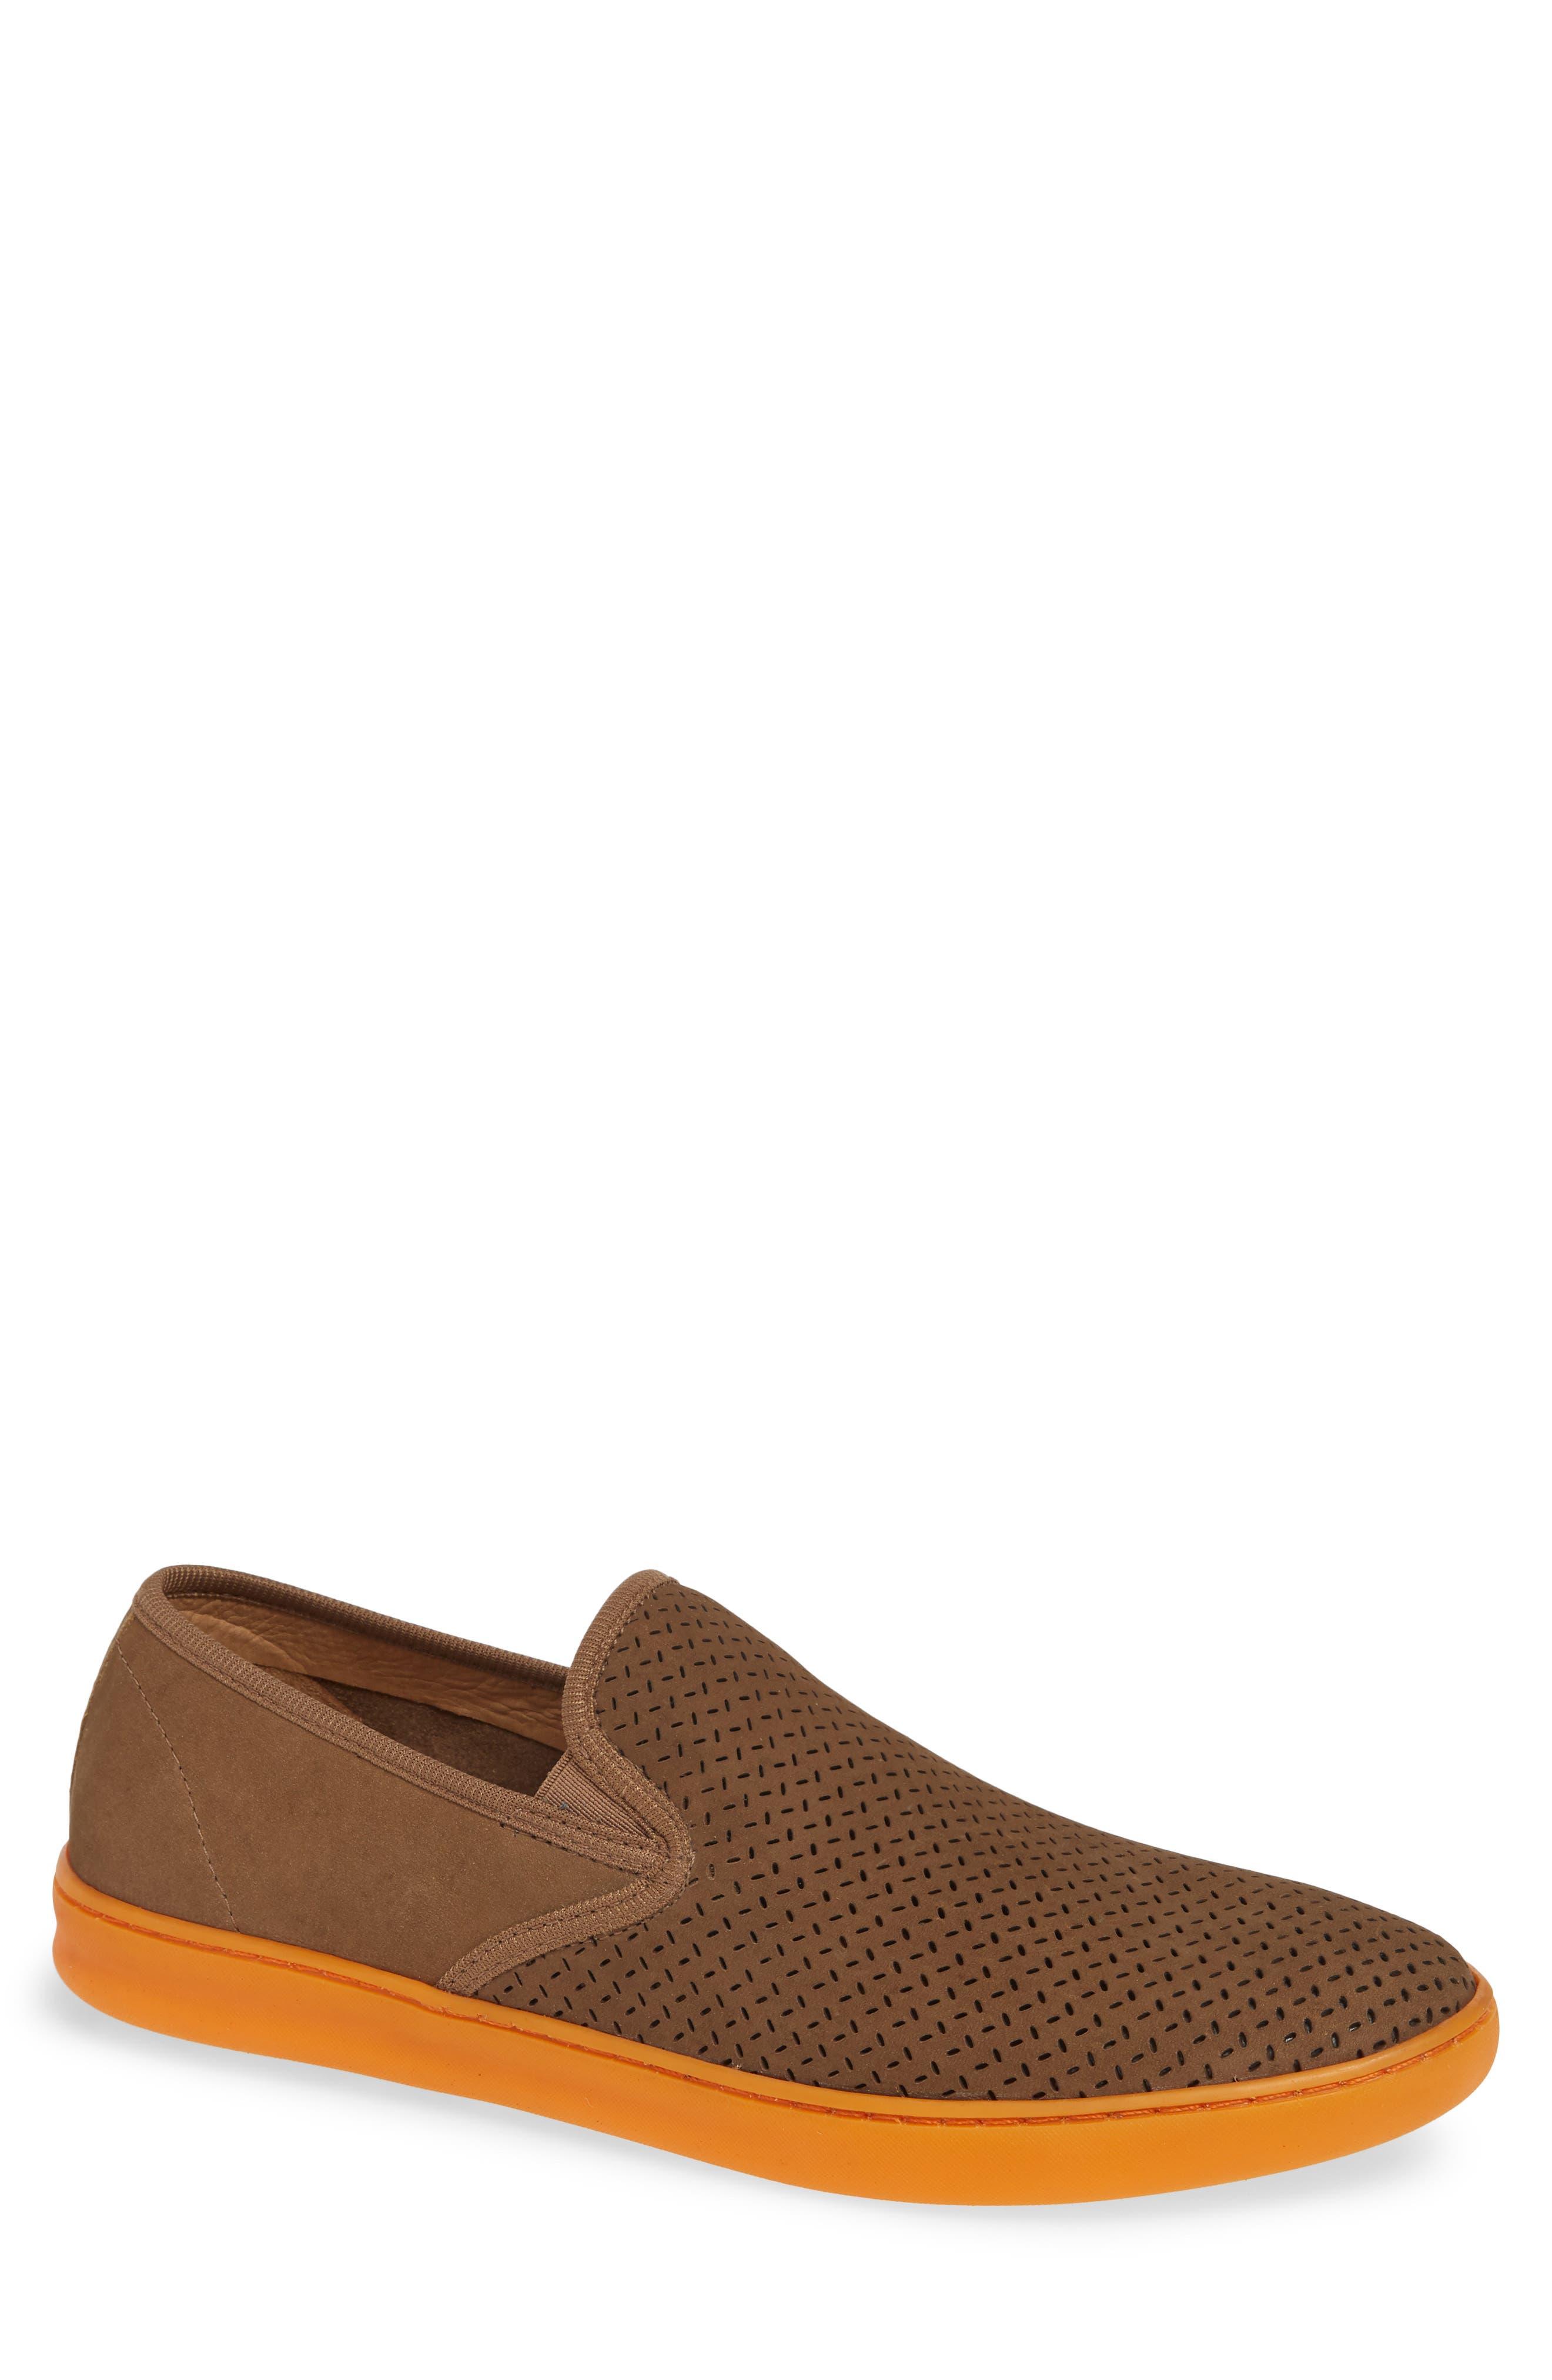 Malibu Perforated Loafer,                             Main thumbnail 1, color,                             SAND NUBUCK